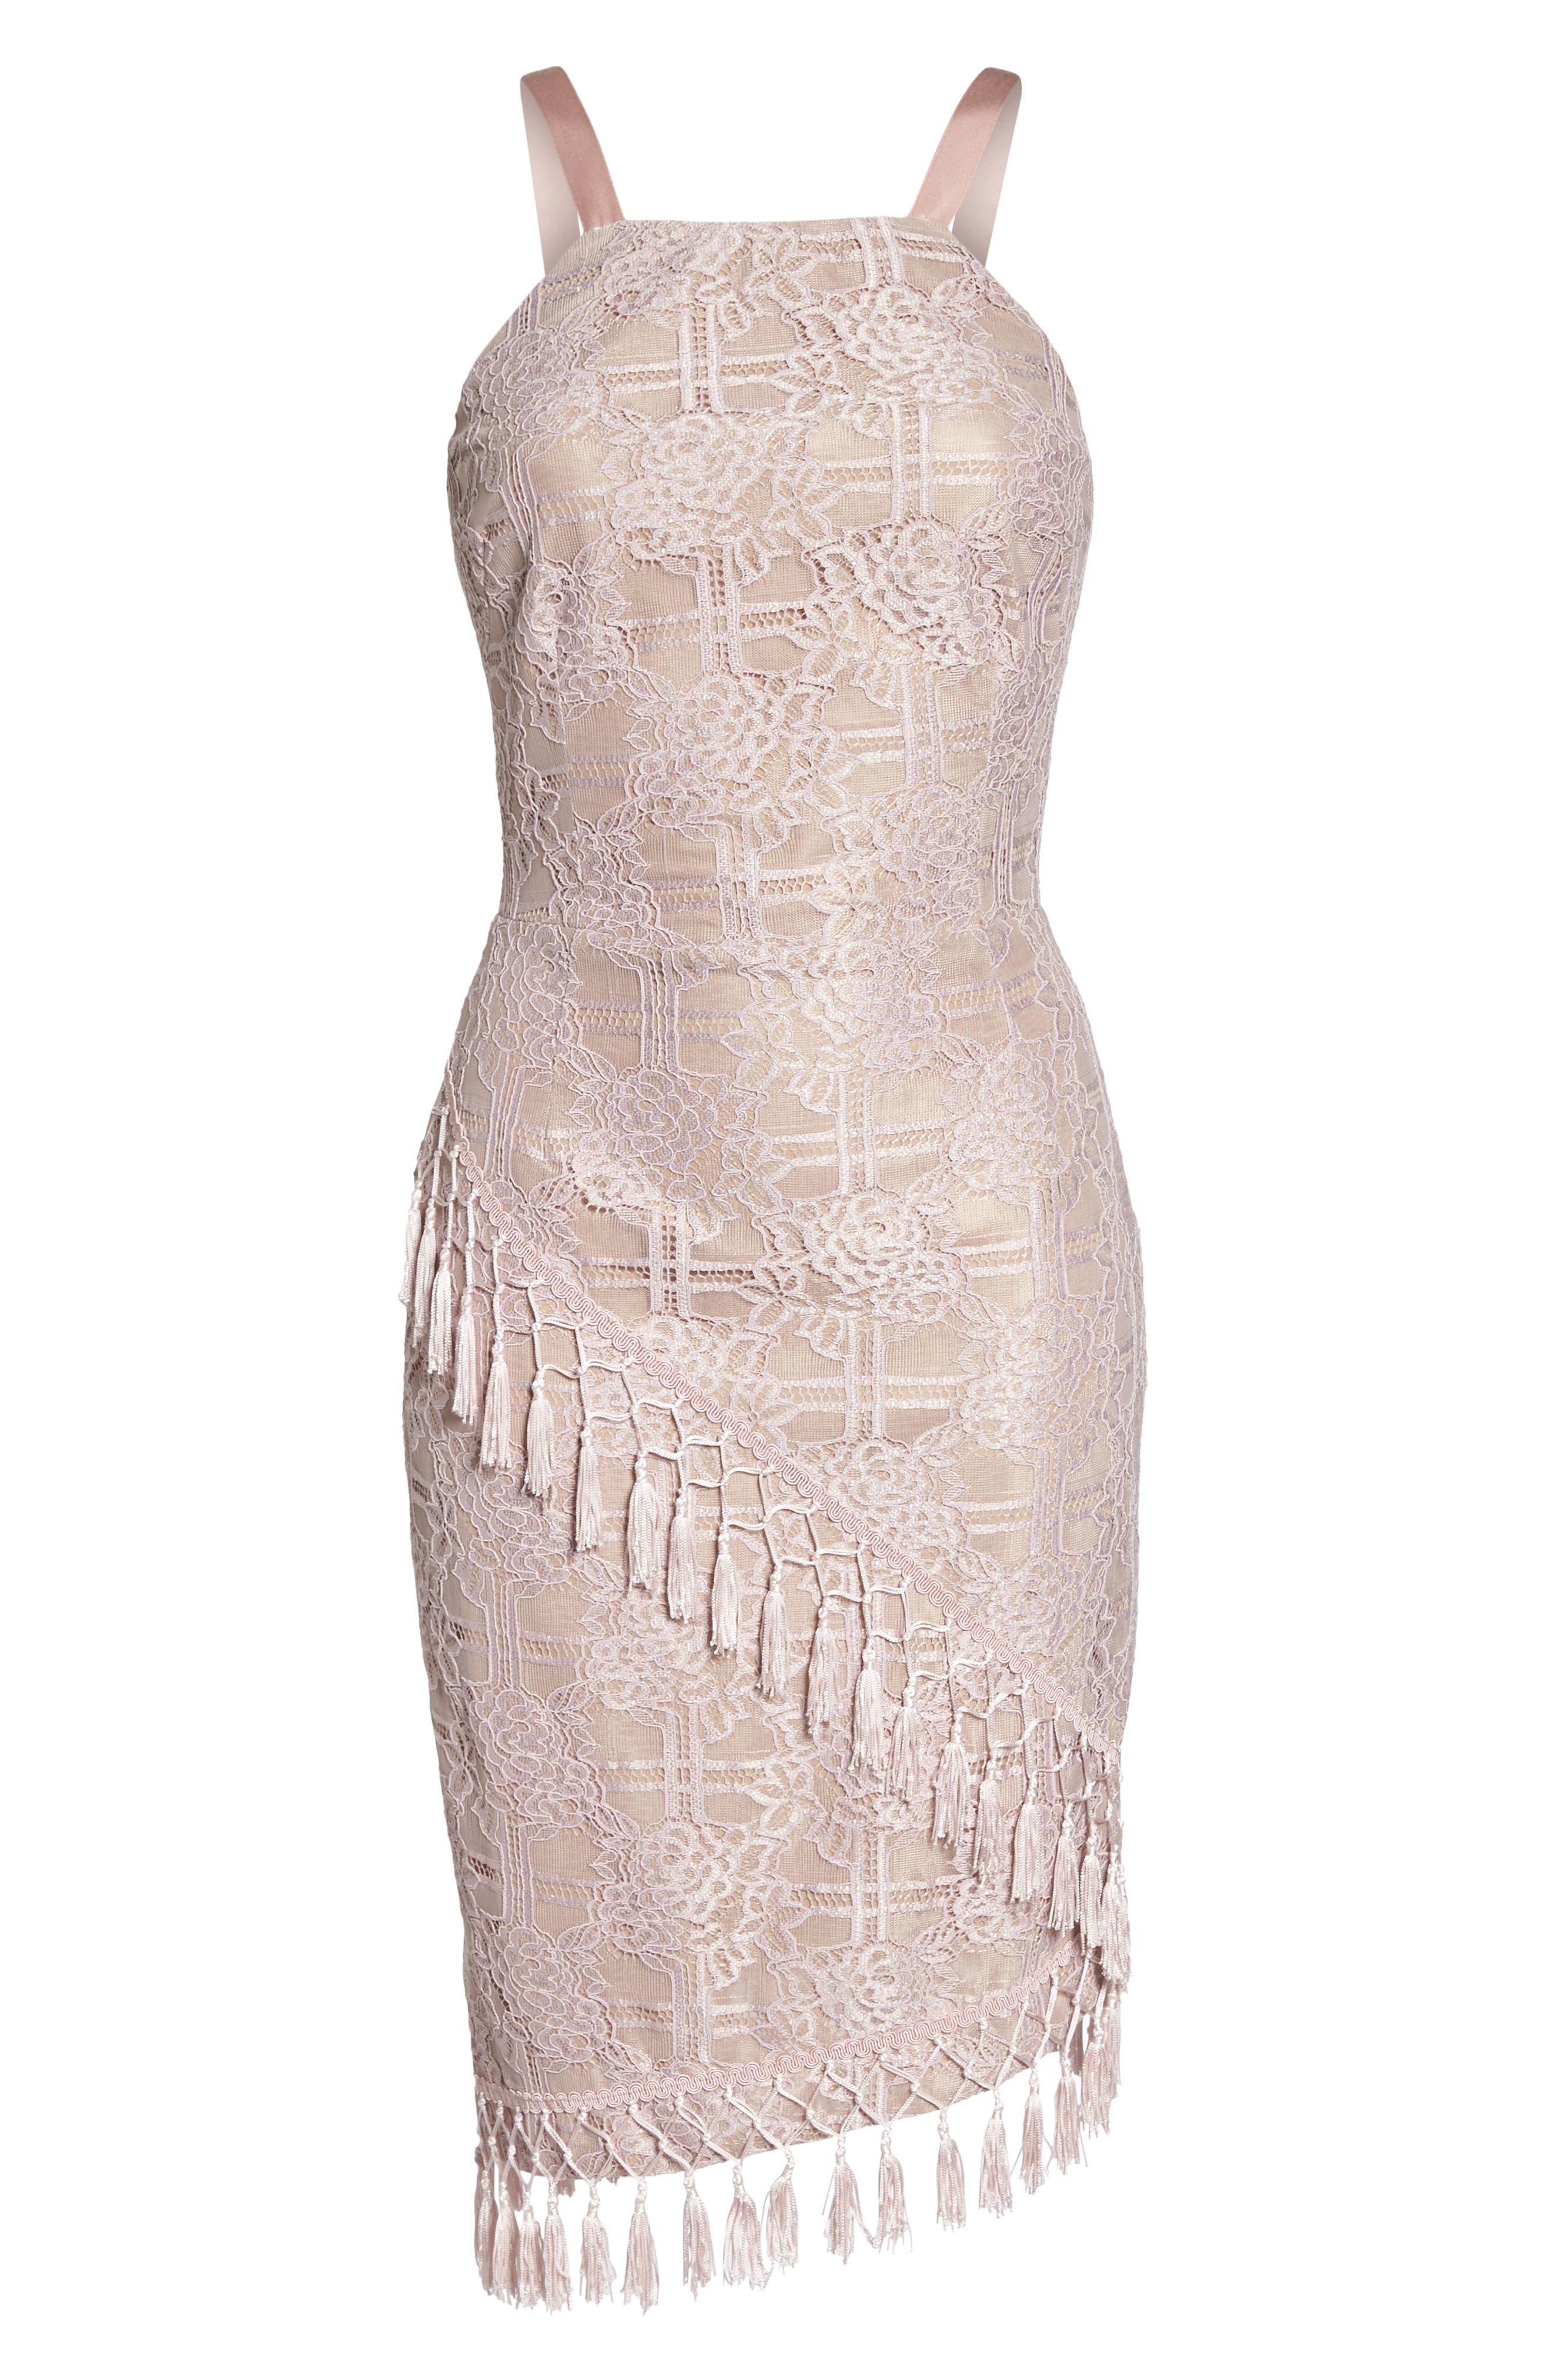 Natasha Asymmetrical Lace Dress,                             Alternate thumbnail 6, color,                             Blush